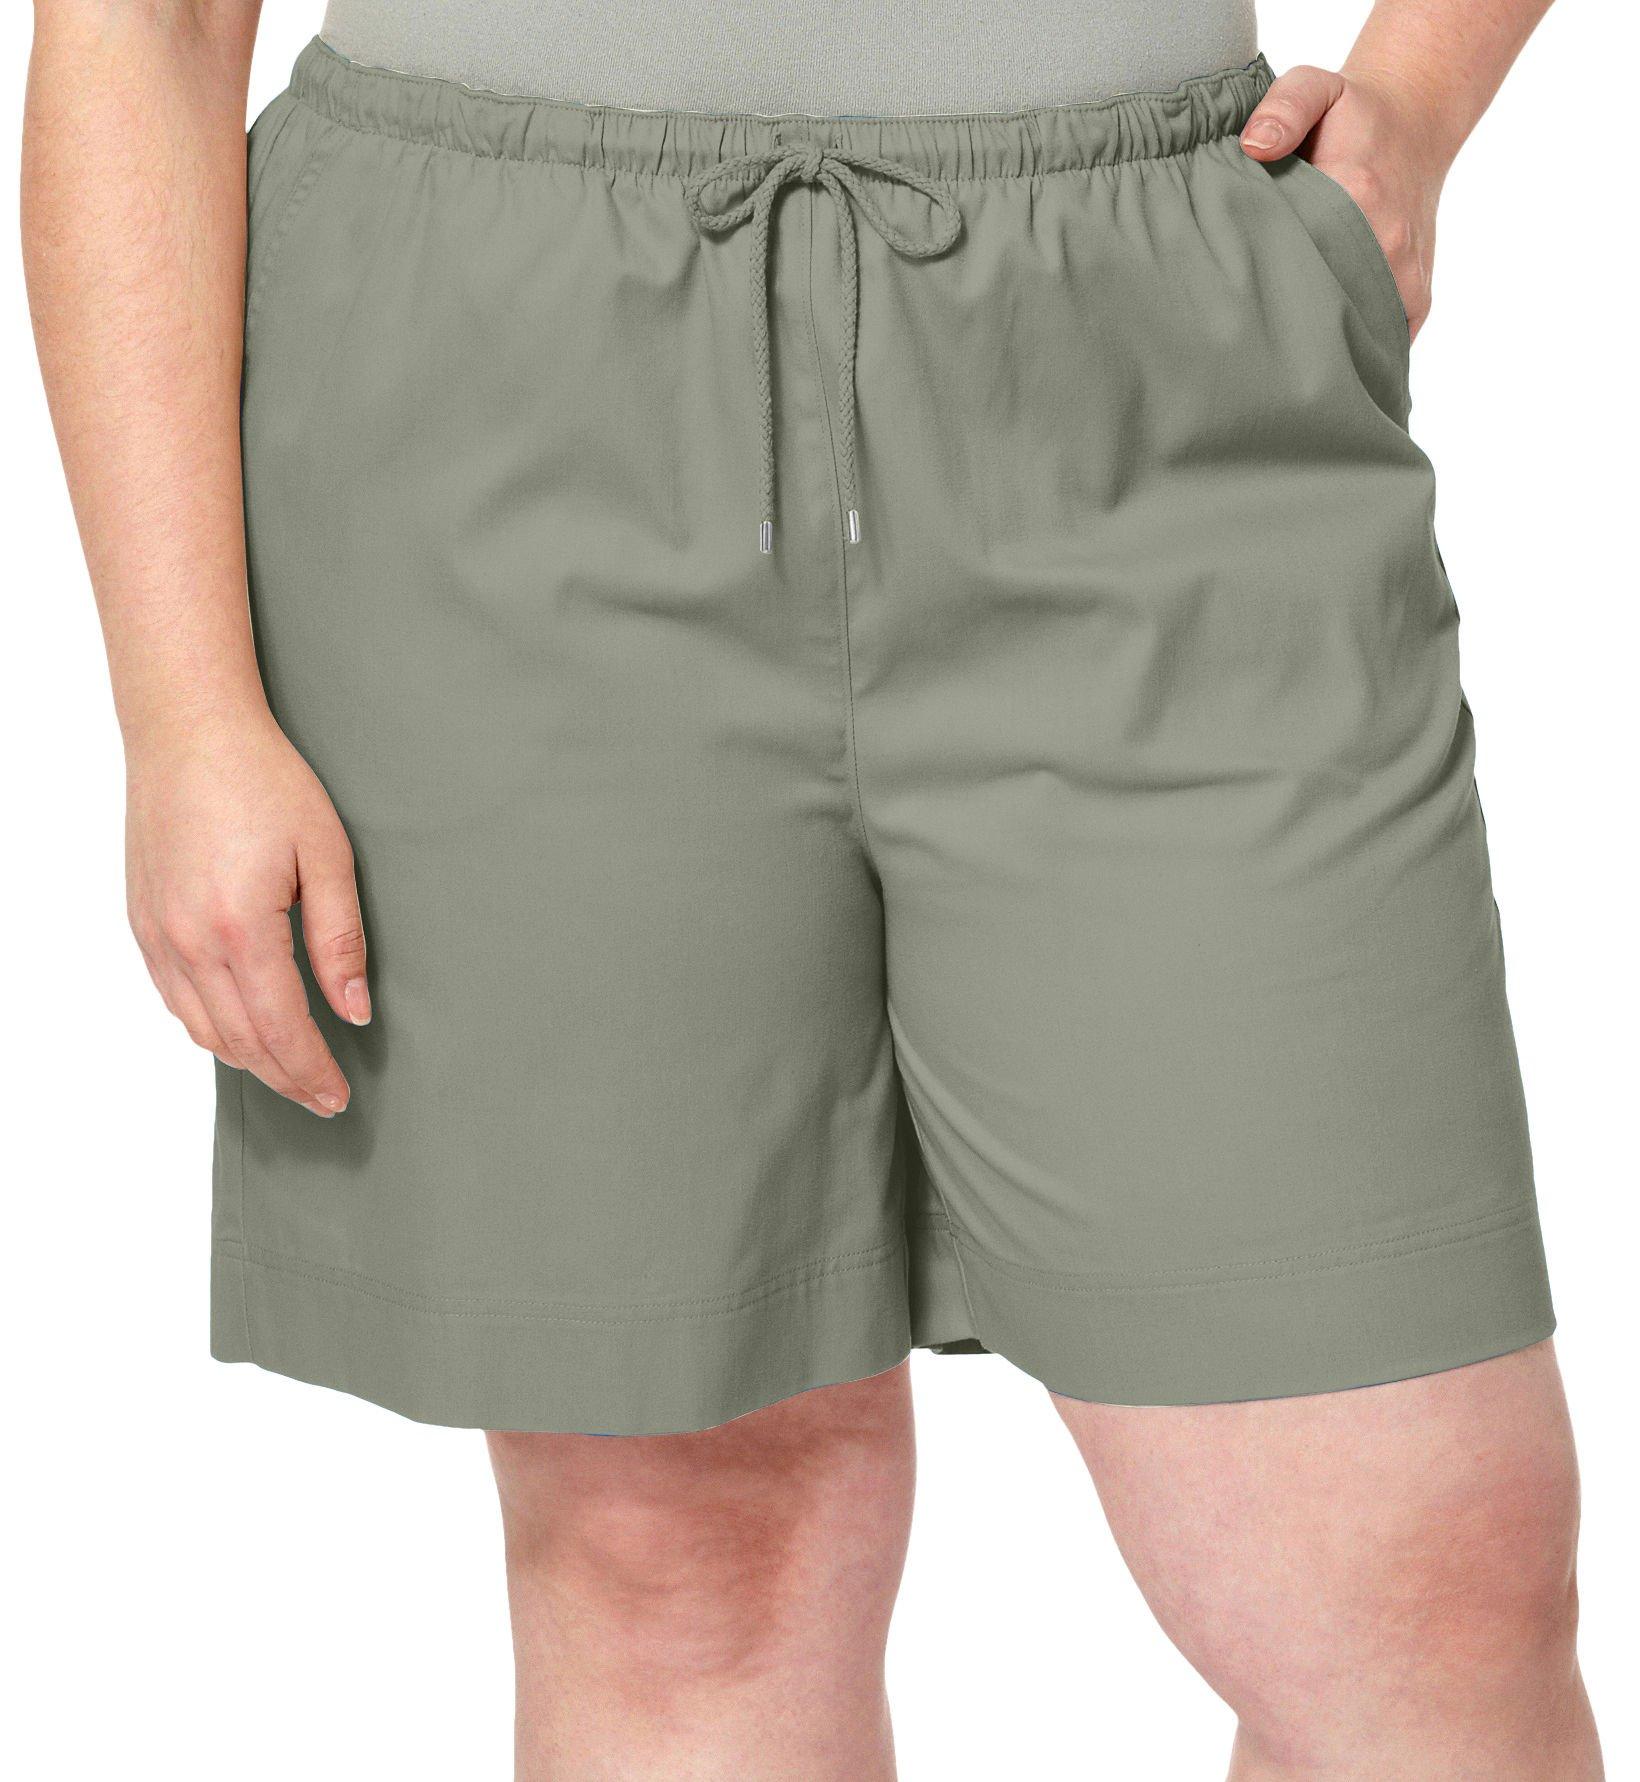 Coral Bay Plus Pull On Drawstring Shorts 2X Shadow Green